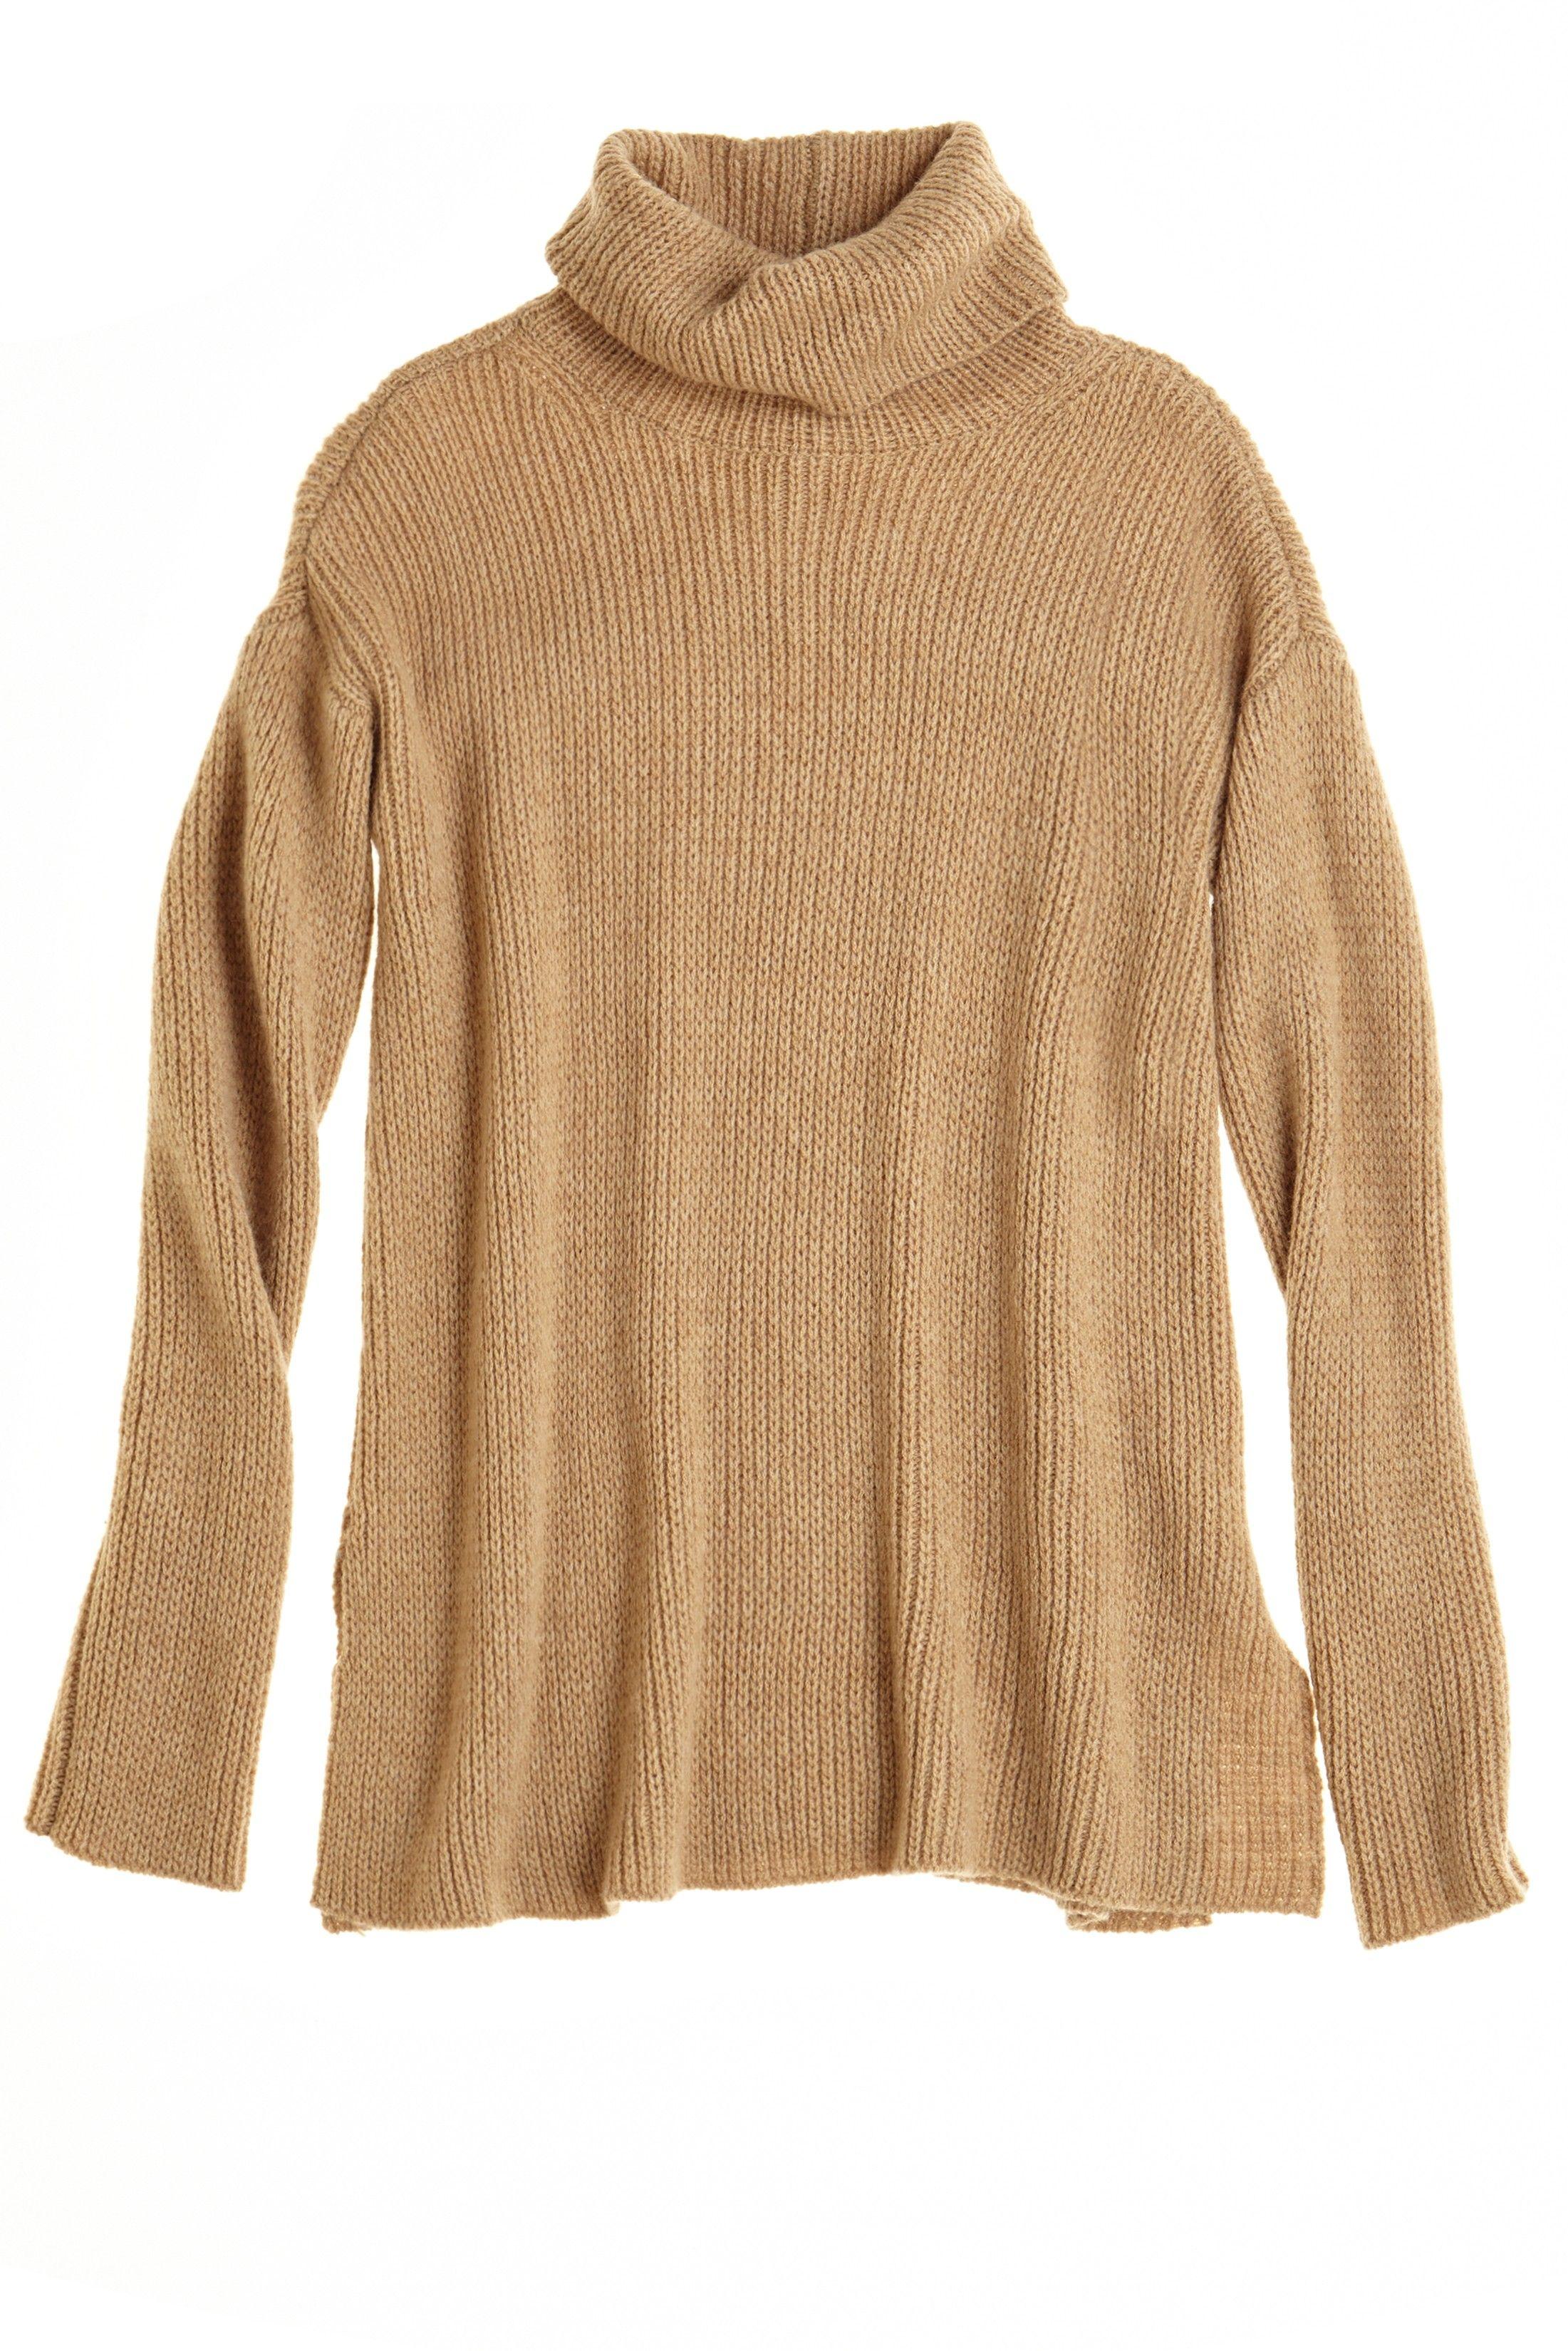 a778889ea4608 Turtleneck sweater - Calypso St. Barth